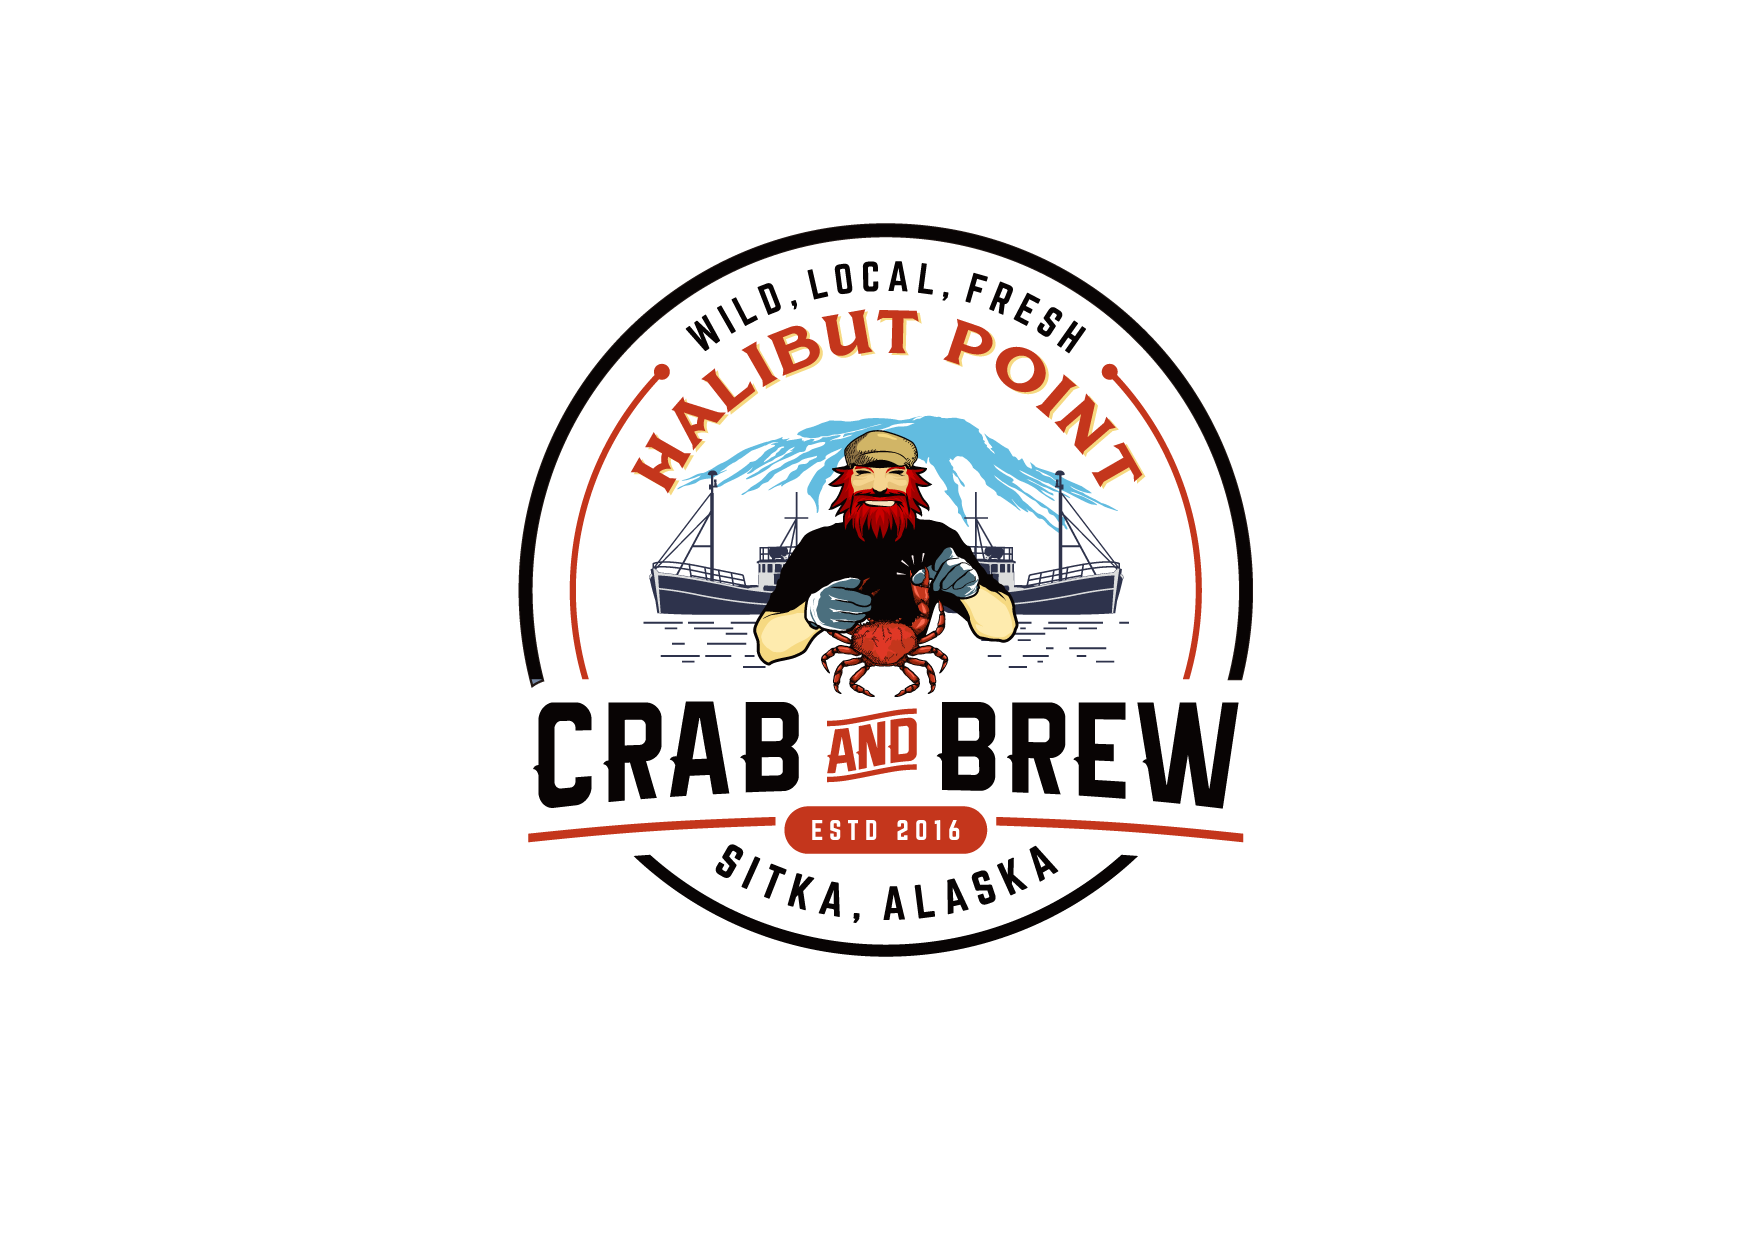 crab restaurant looking for creative conversation-starting logo